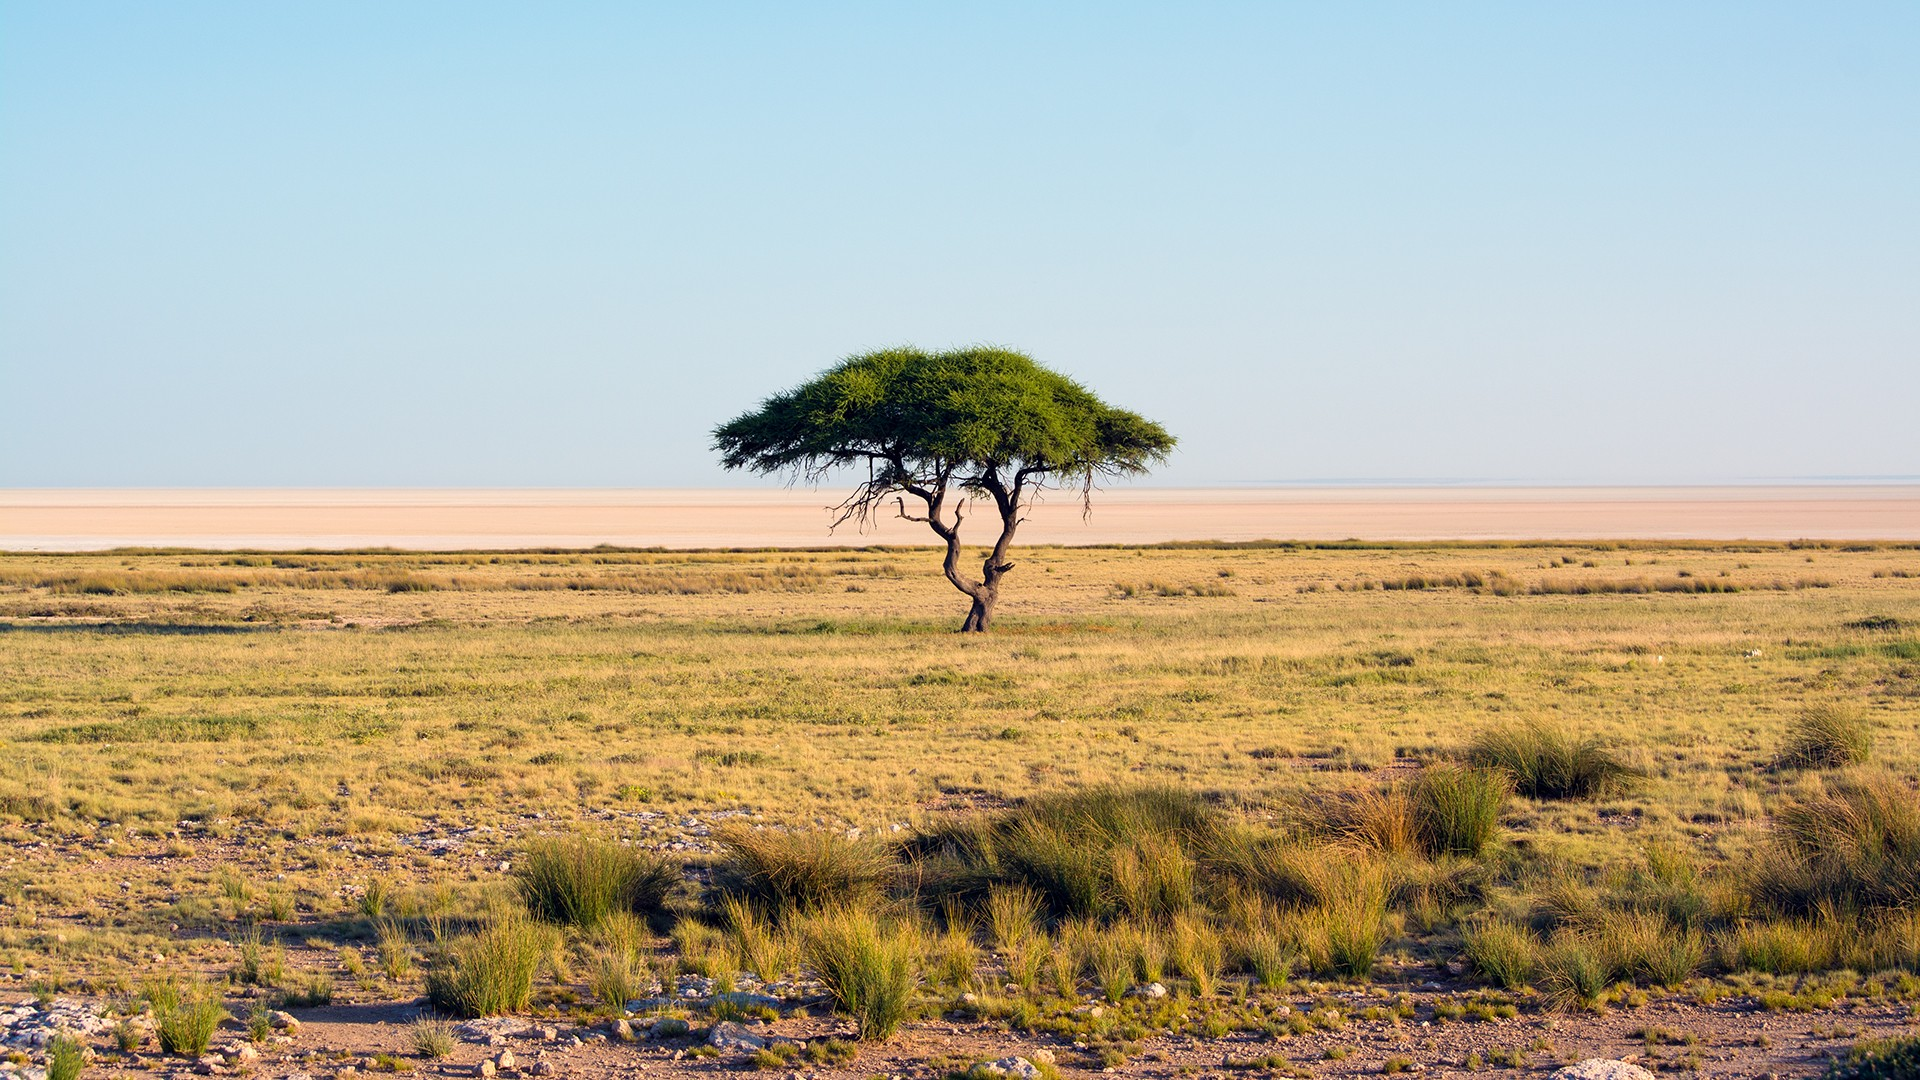 General 1920x1080 nature Namibia trees landscape savannah national park Africa sky